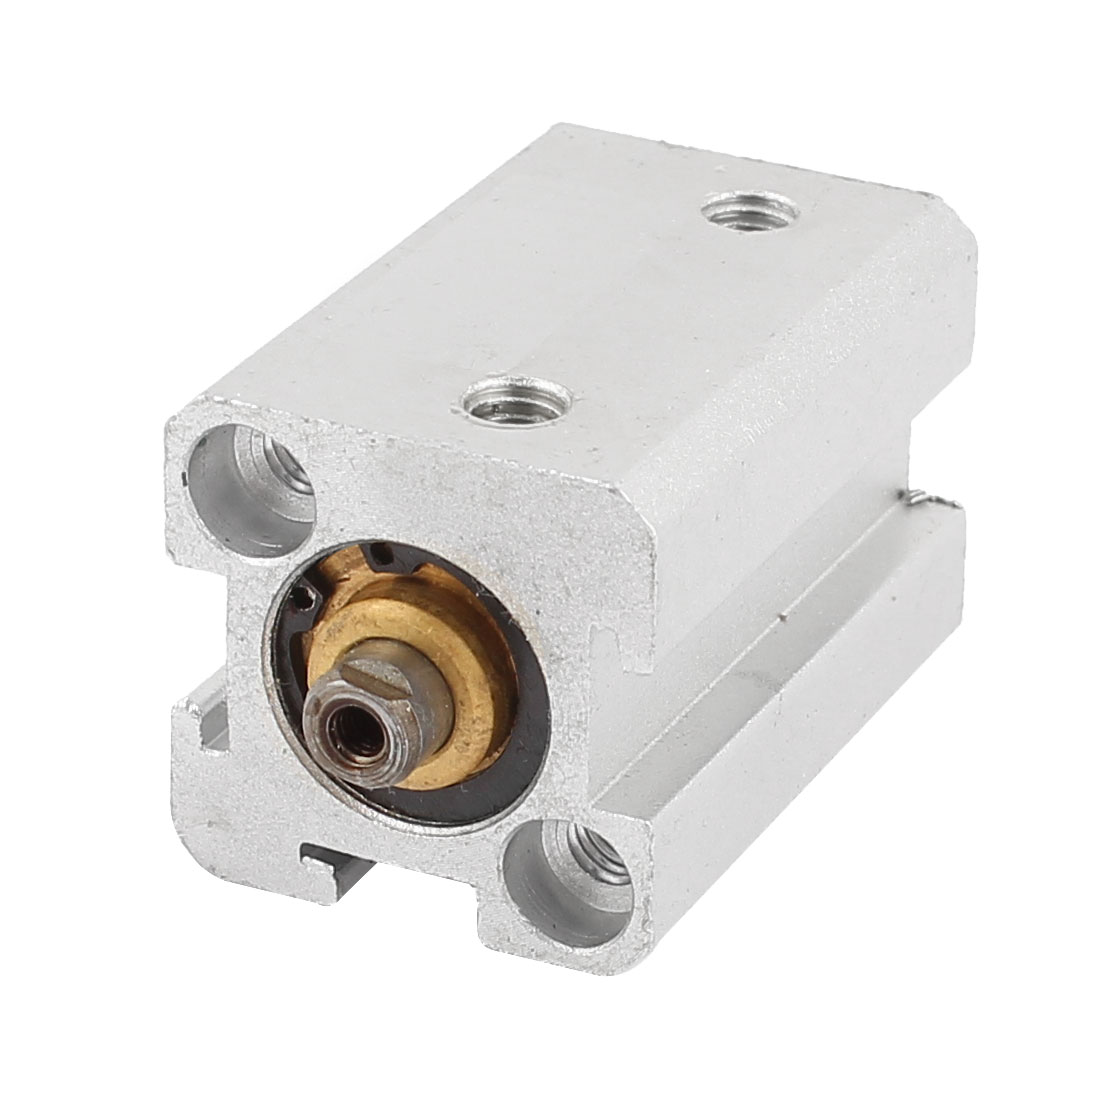 KSDA12x20 20mm Stroke 12mm Bore Aluminium Pneumatic Compact Air Cylinder